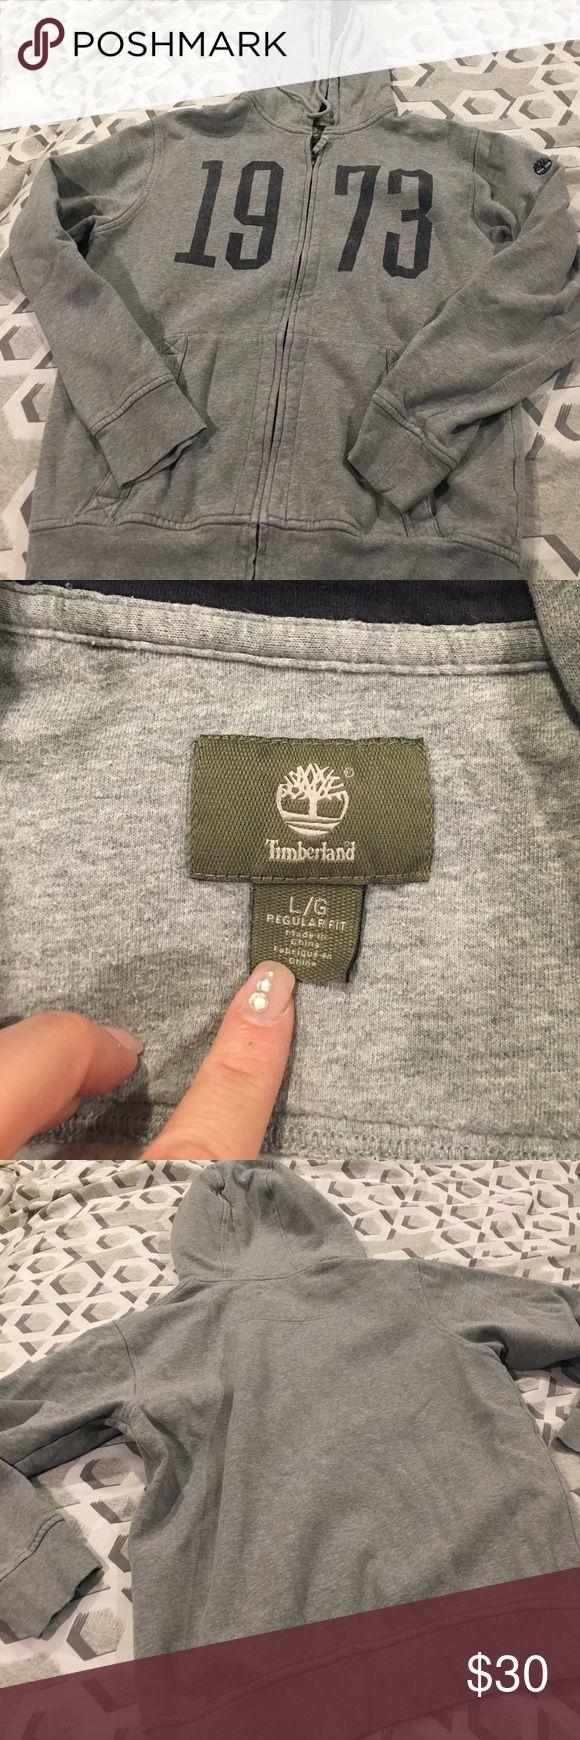 Timberland hoodie Gray and blue timberland  zip up Hoodie. Timberland Shirts Sweatshirts & Hoodies